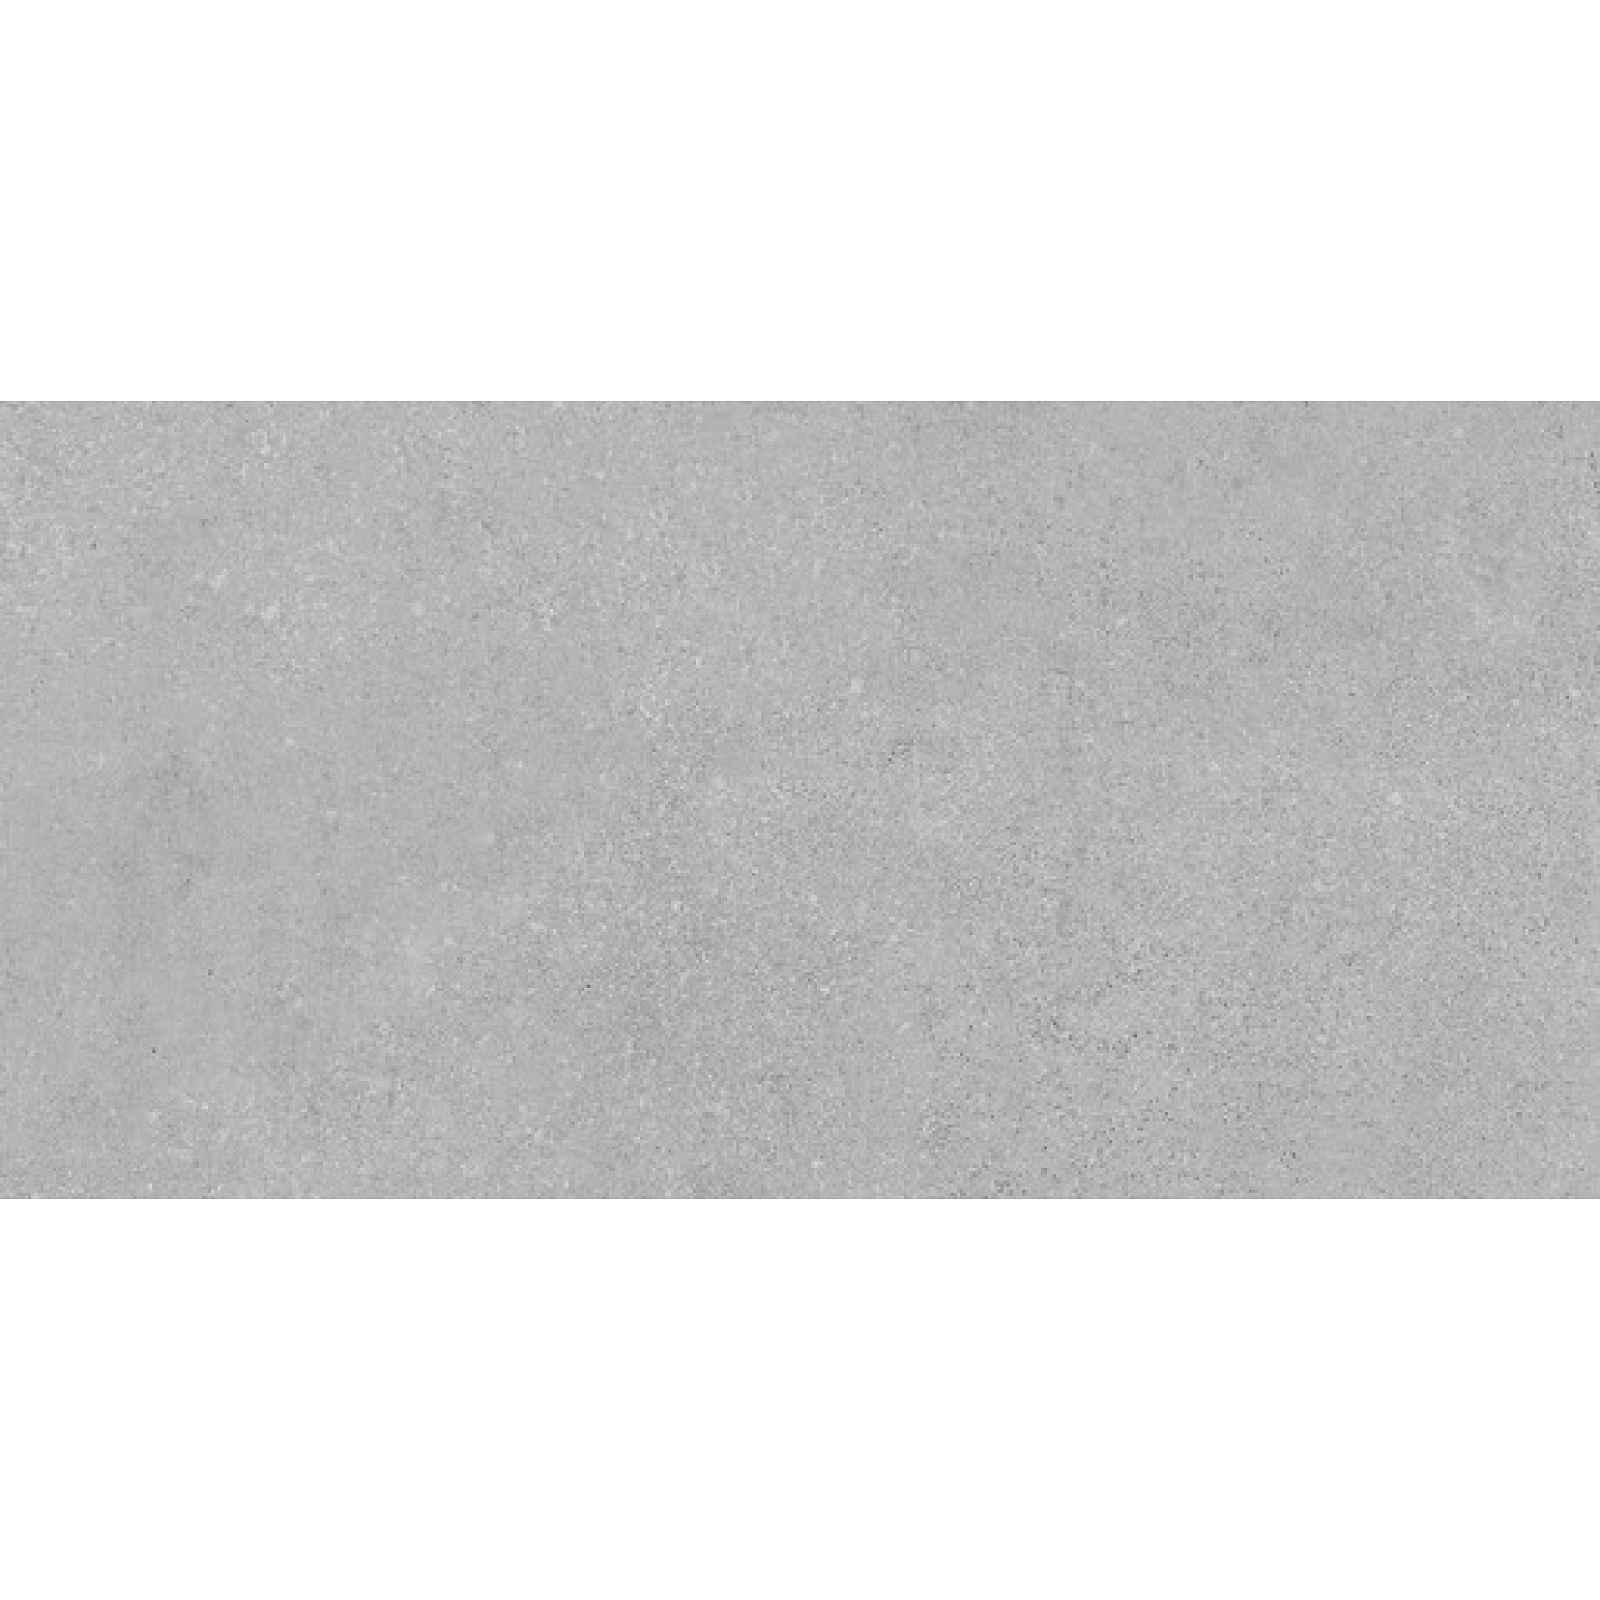 Obklad RAKO Form Plus tmavě šedá 20x40 cm mat WADMB697.1